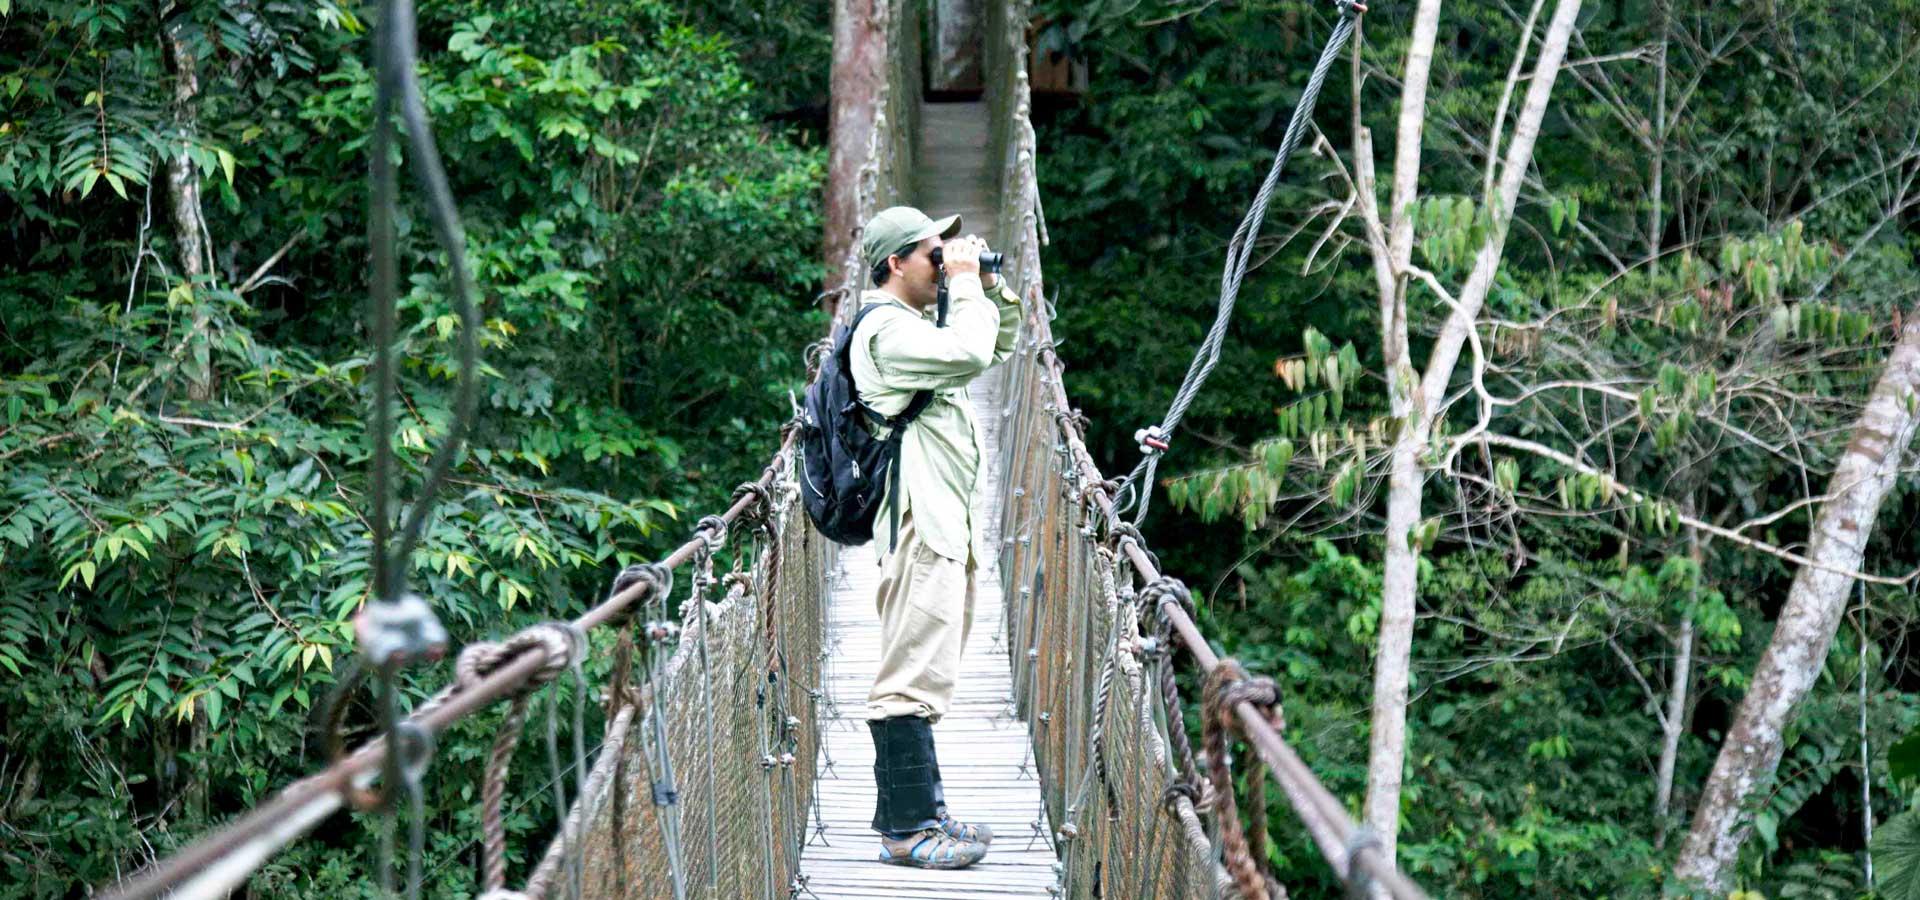 JungleExperiences-ZafiroCruise-Canopy.7-copie